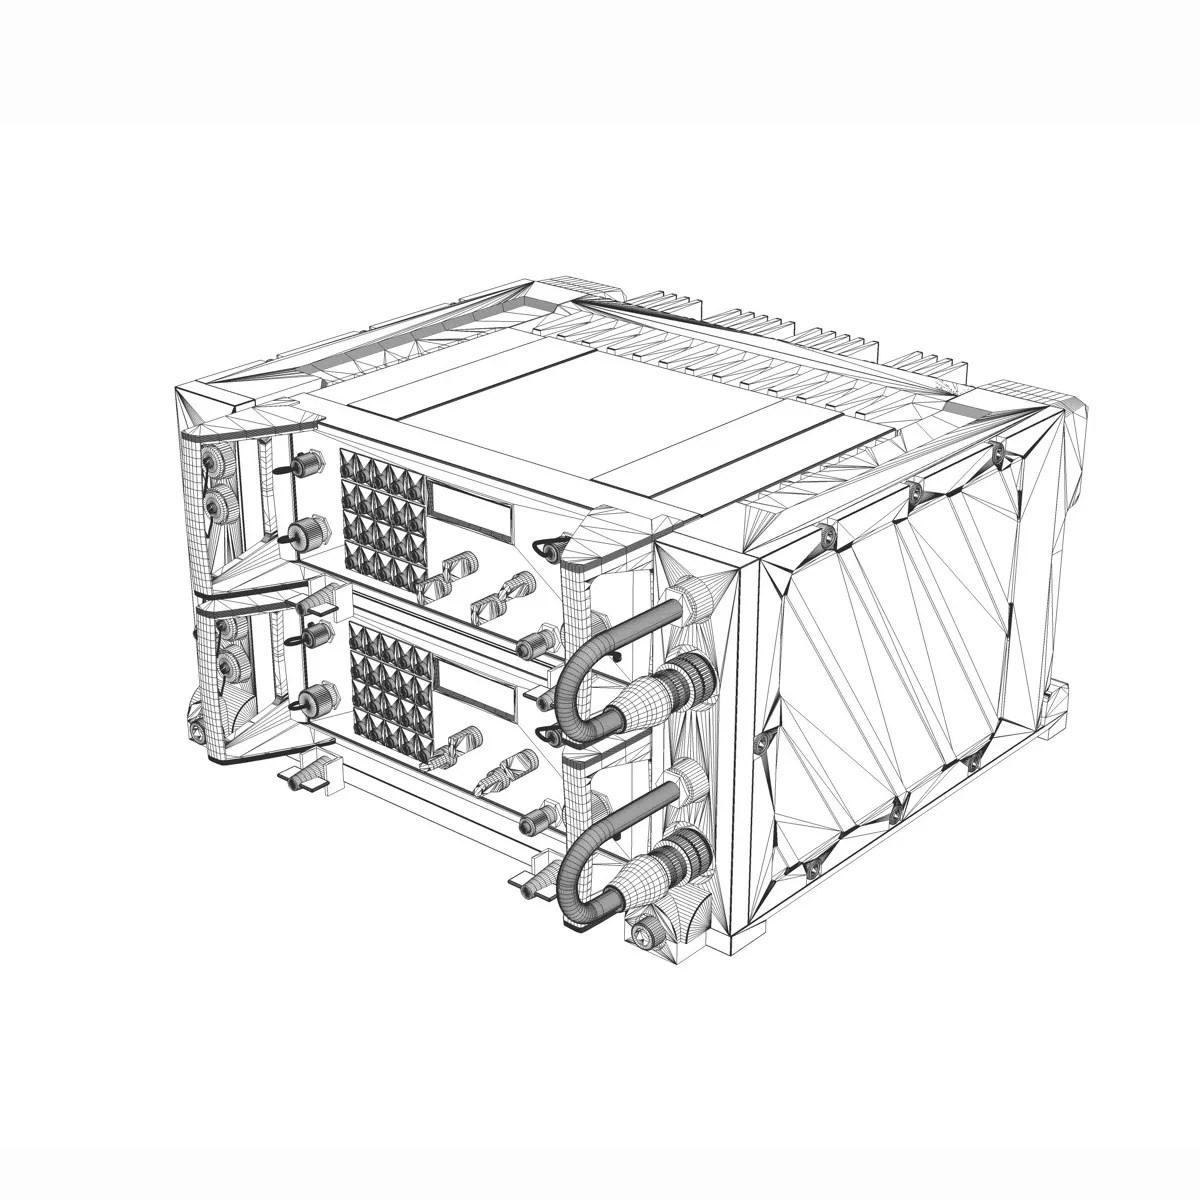 Uhf Military Radio System